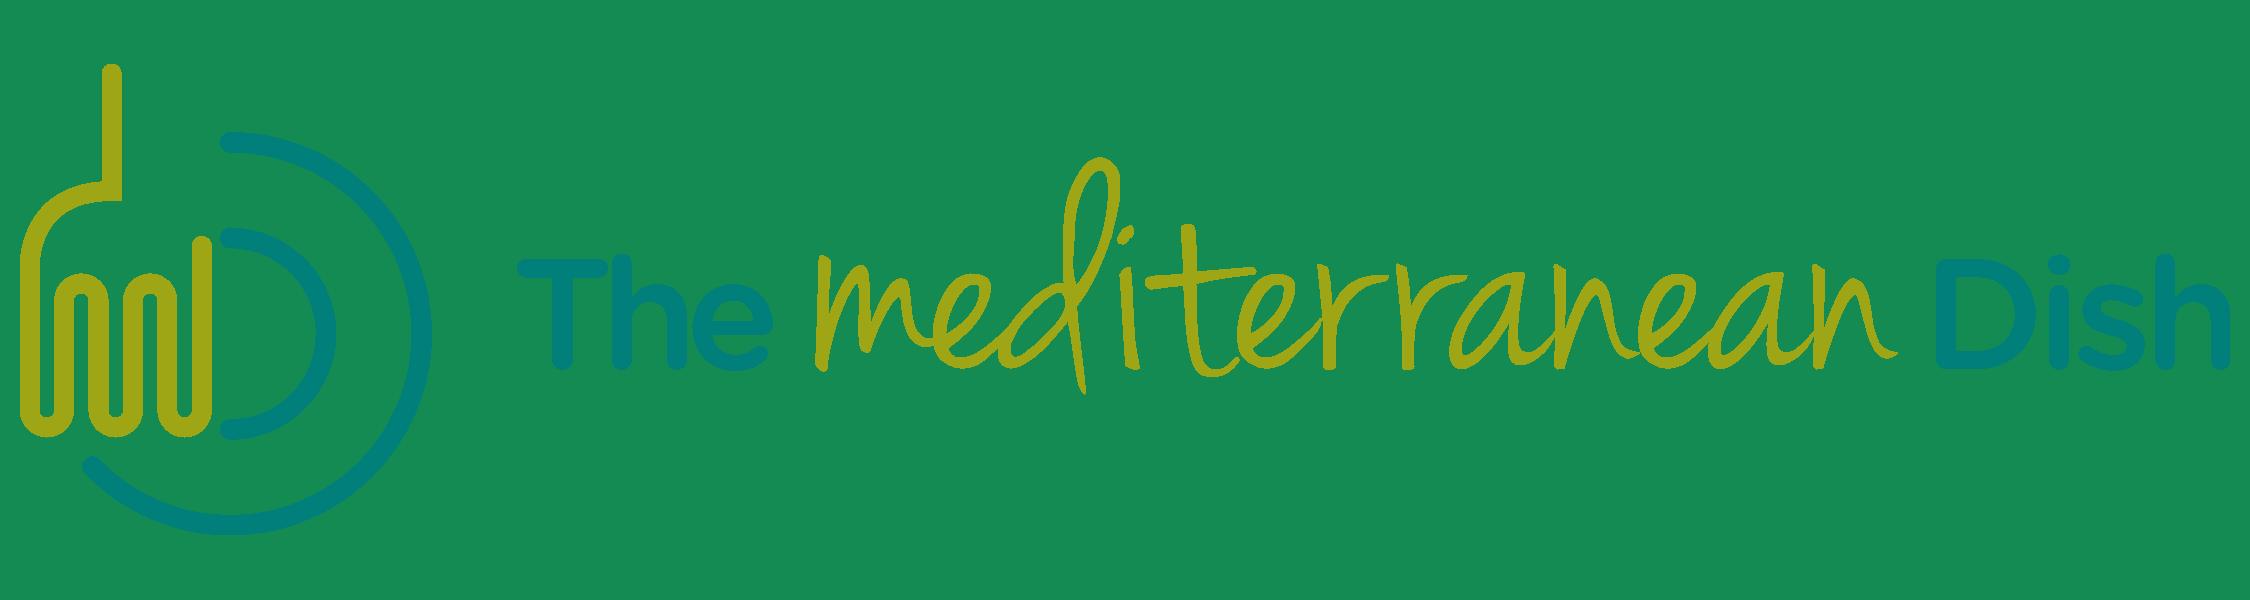 The Mediterranean Dish logo